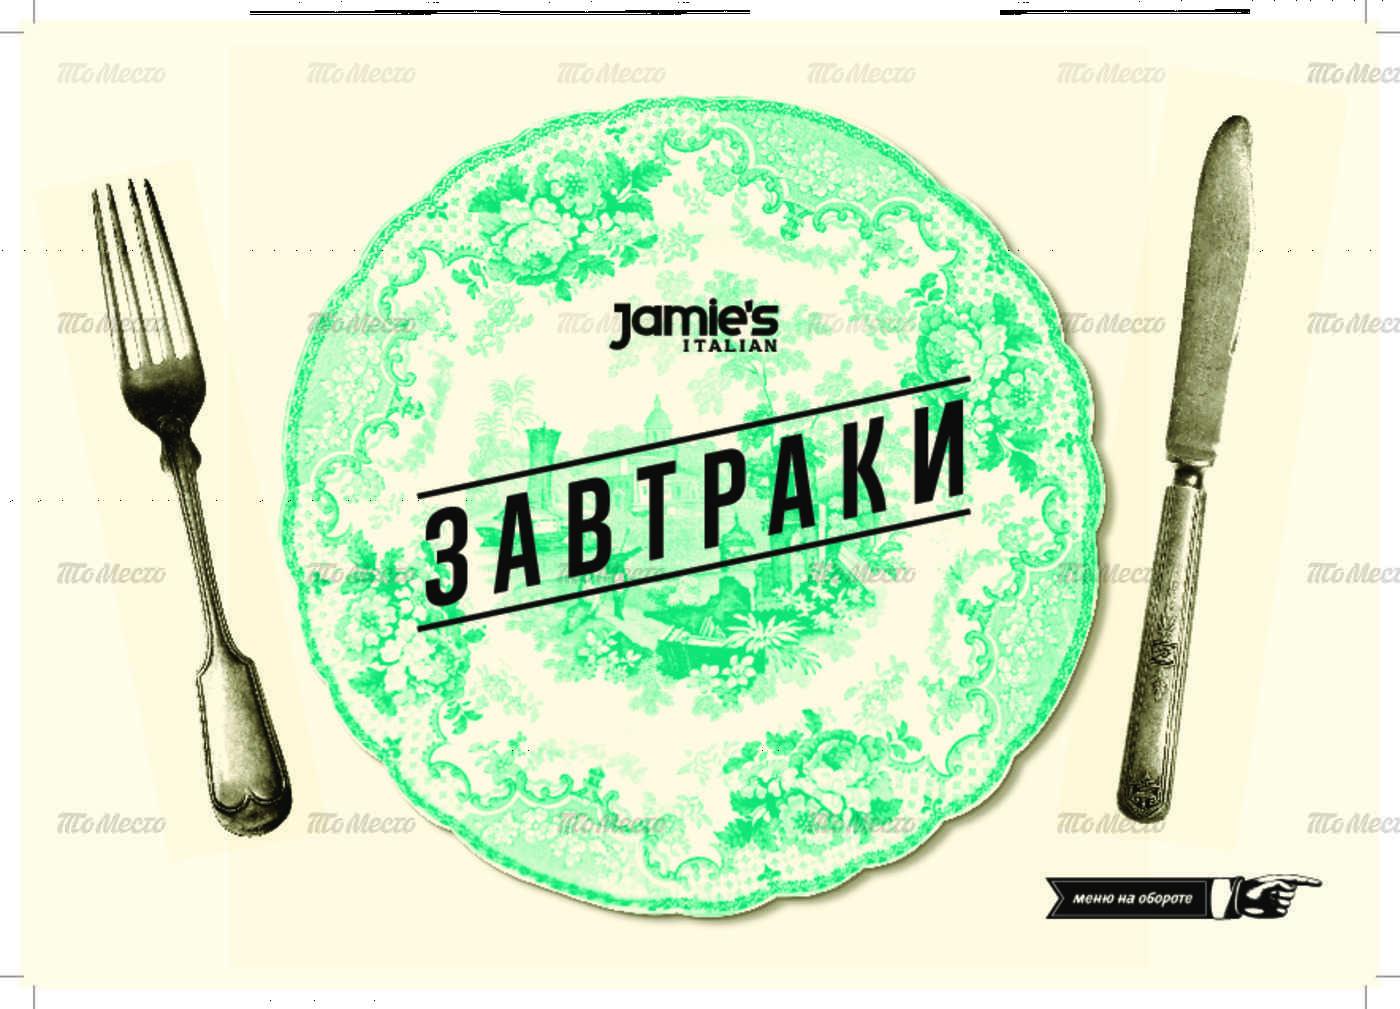 Меню ресторана Jamie's Italian (Джеймис Италиан) на Конюшенной площади фото 25